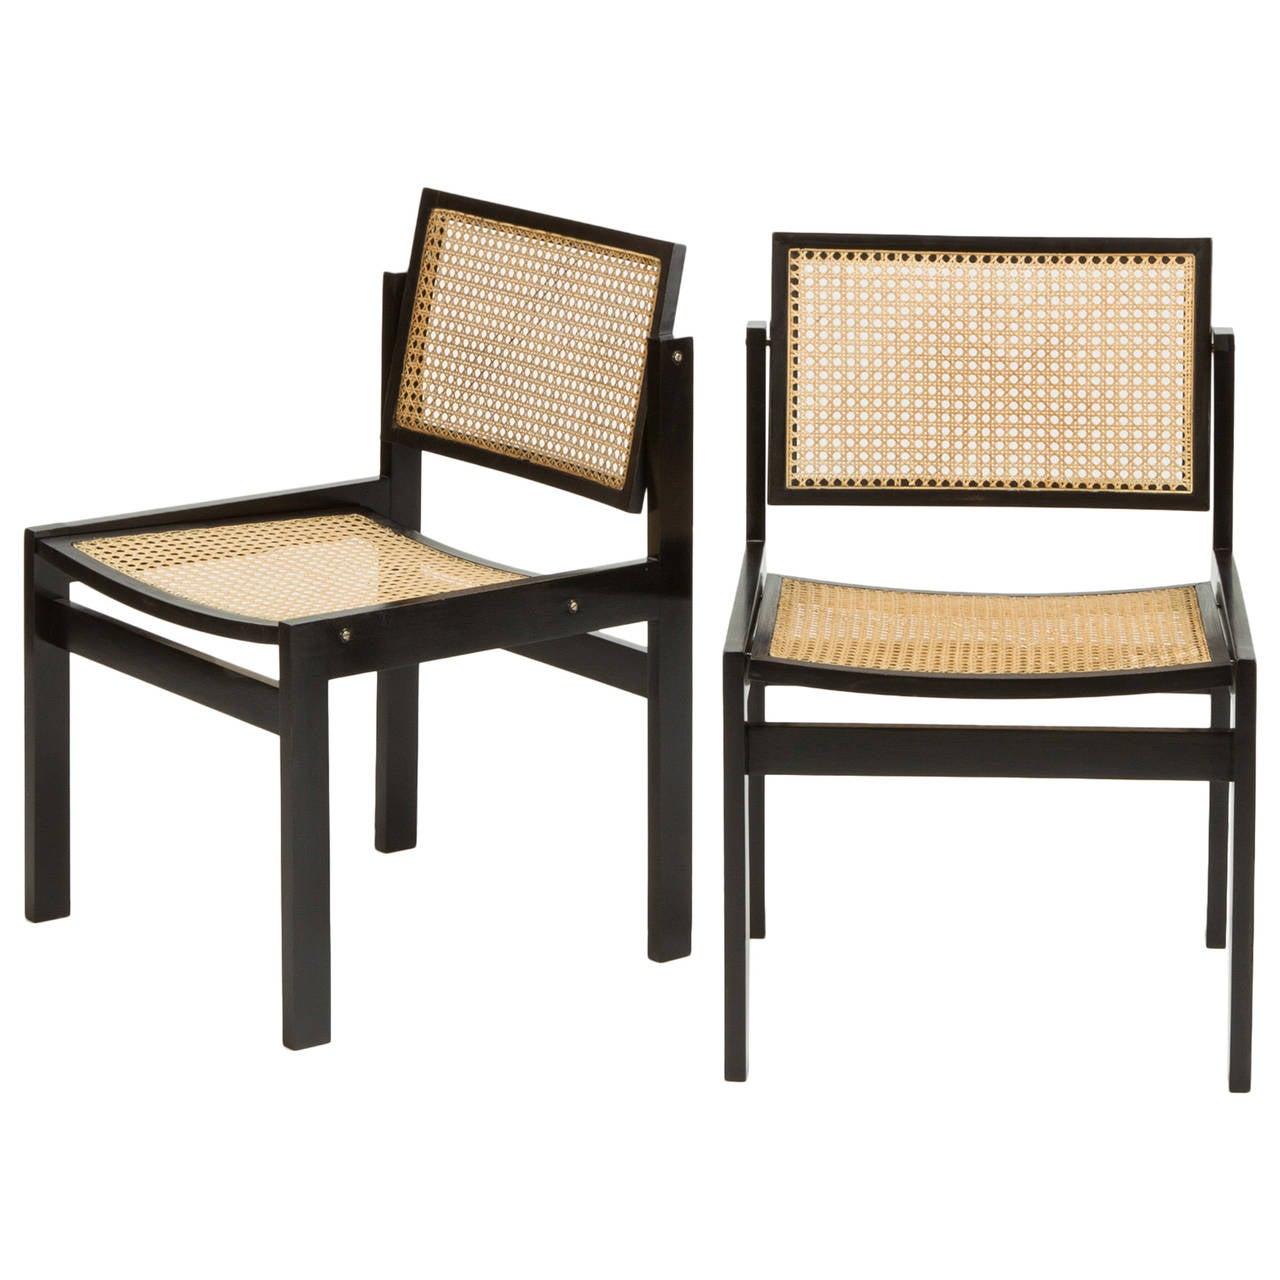 Pair of Swiss Dining Chairs by Kurt Thut, 1950s